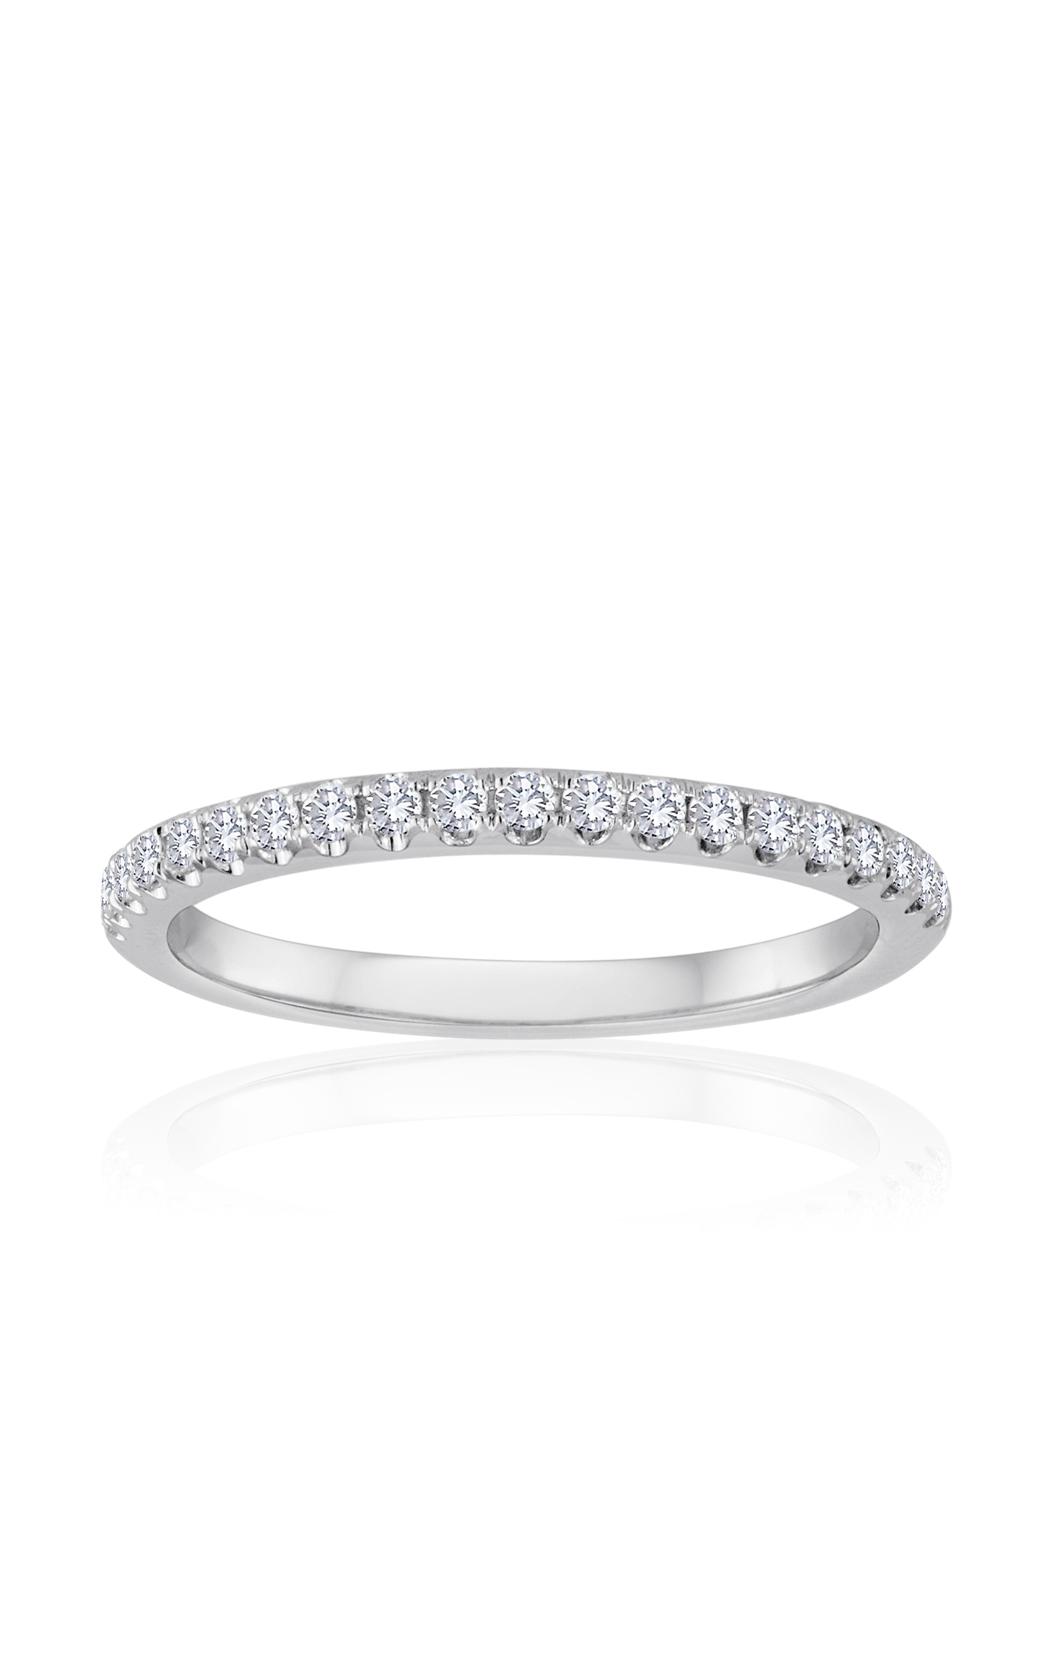 Imagine Bridal Fashion Rings 70156D-1 4 product image